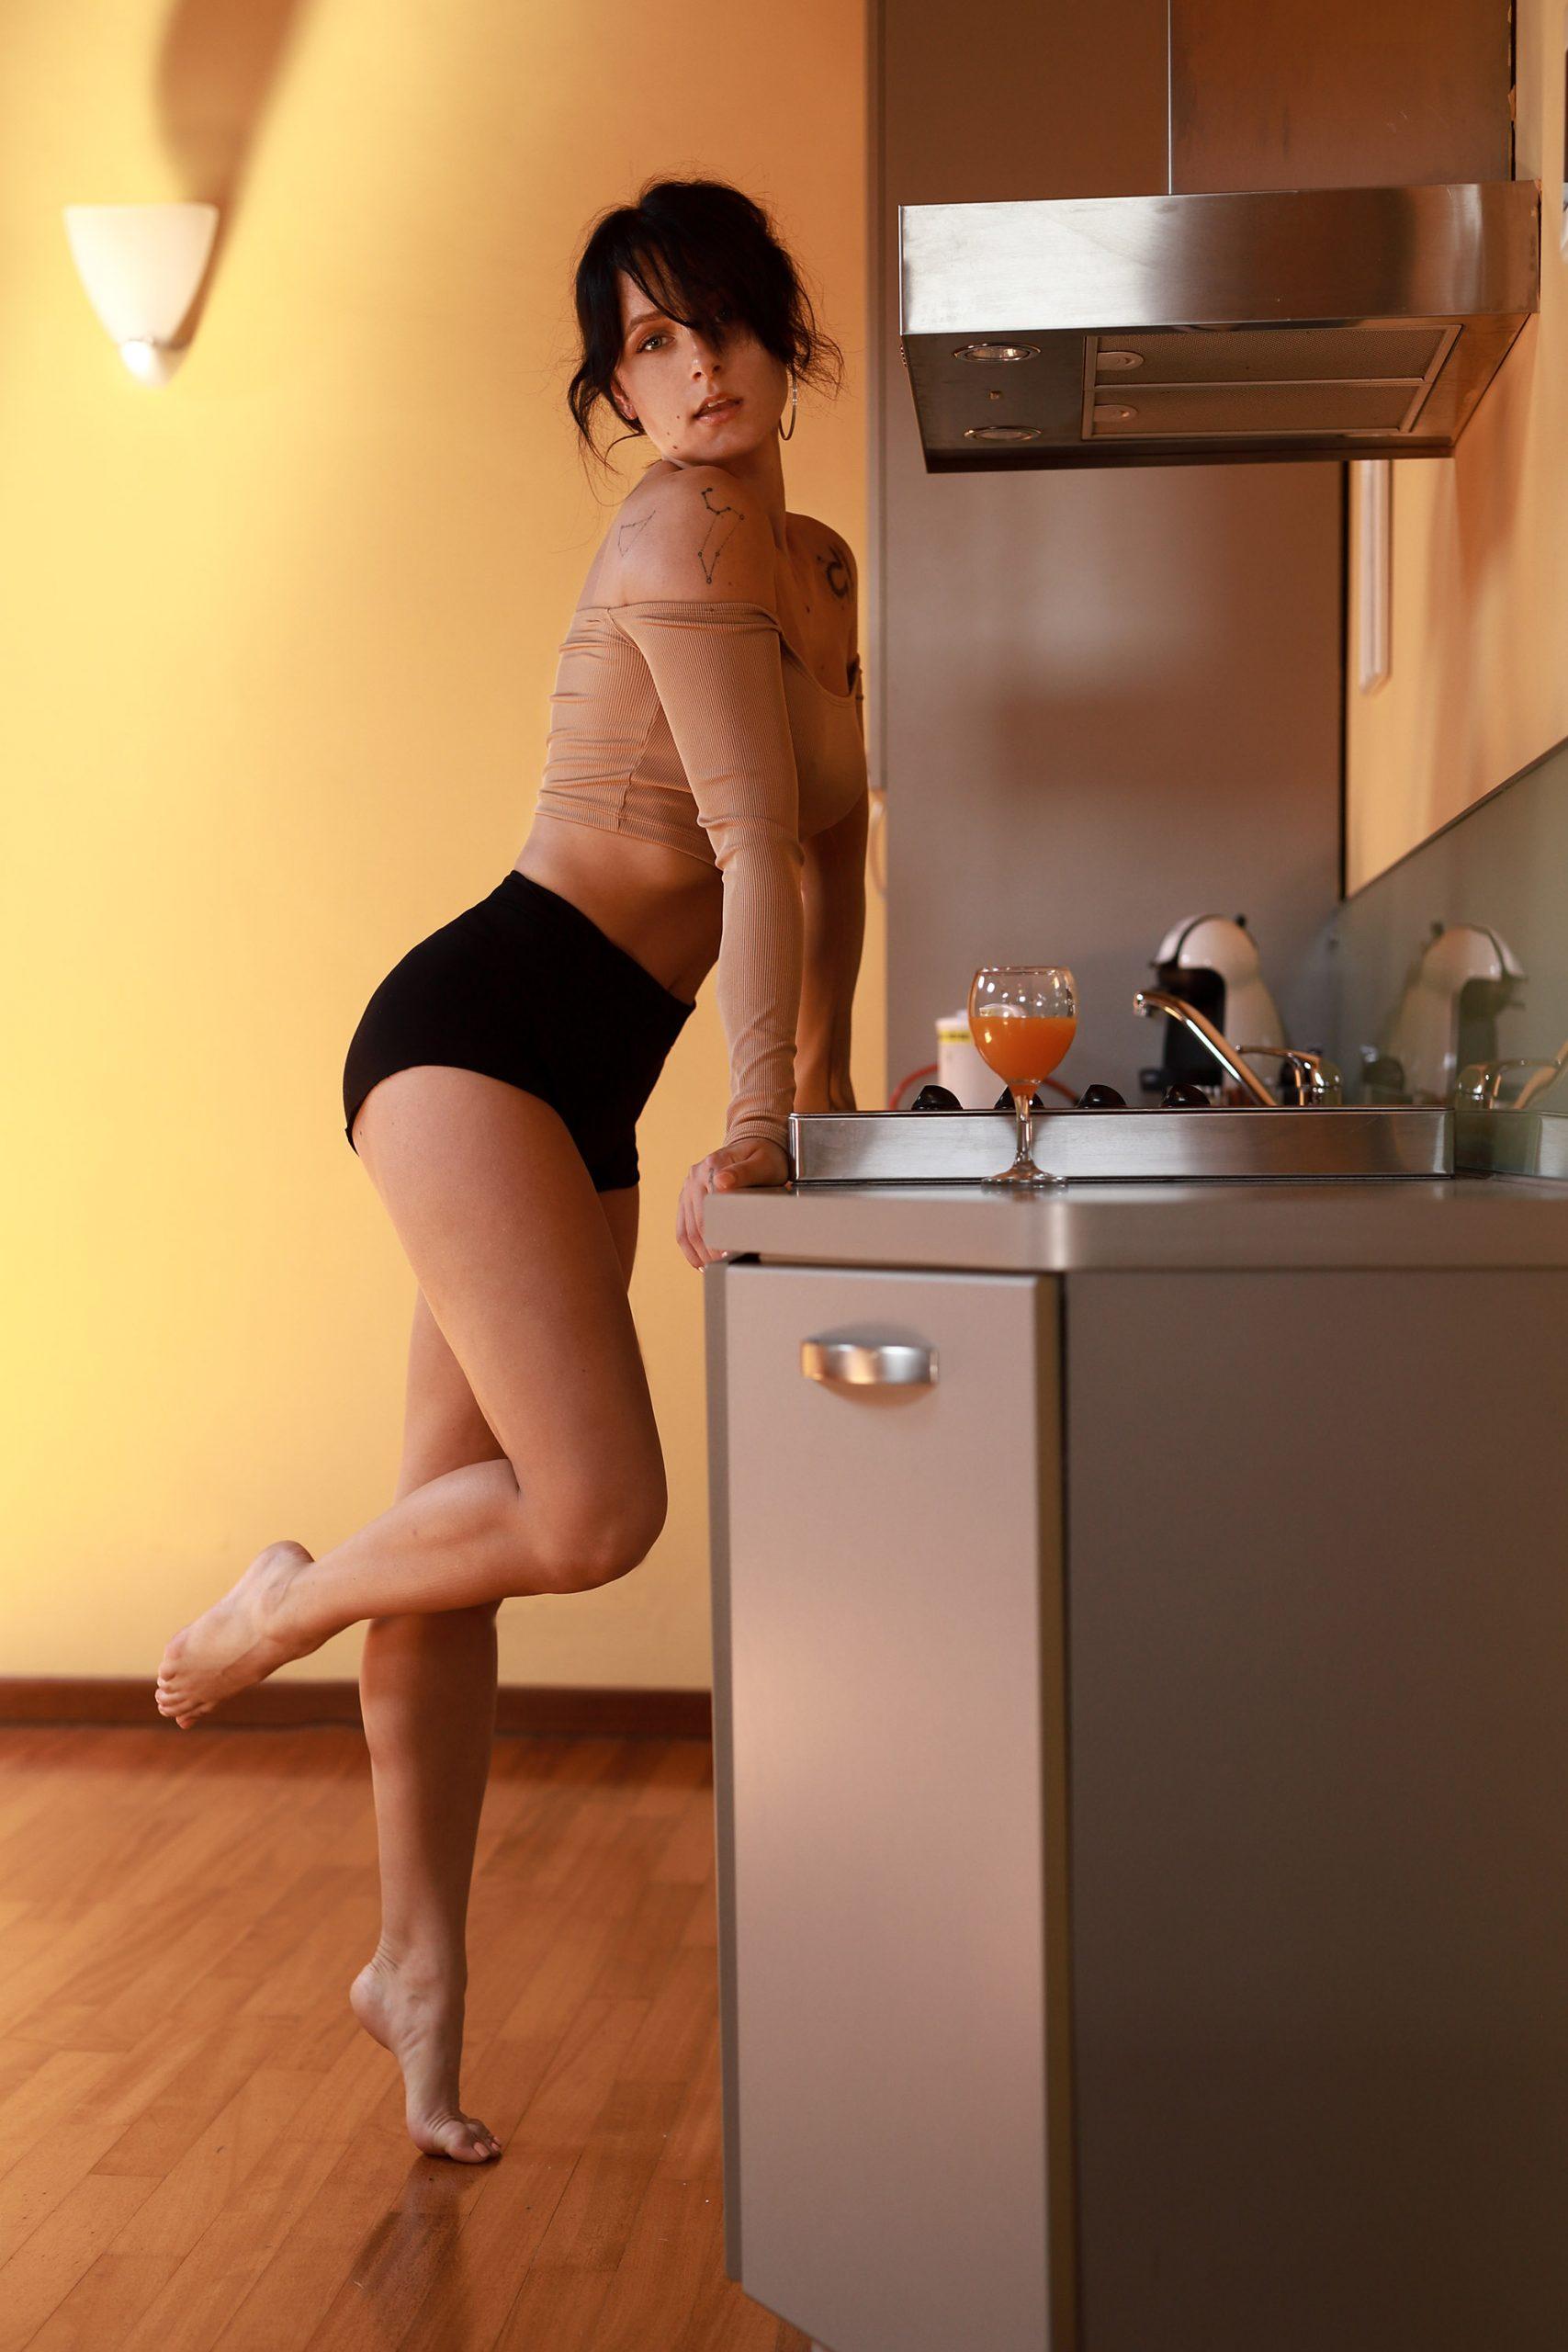 Categorie: Boudoir & Nude, Glamour, Portrait; Photographer: LUCA BARTOLI (ElleBierre photographer); Model: ADRIANA MITITELU; Location: Ferrara, FE, Italia